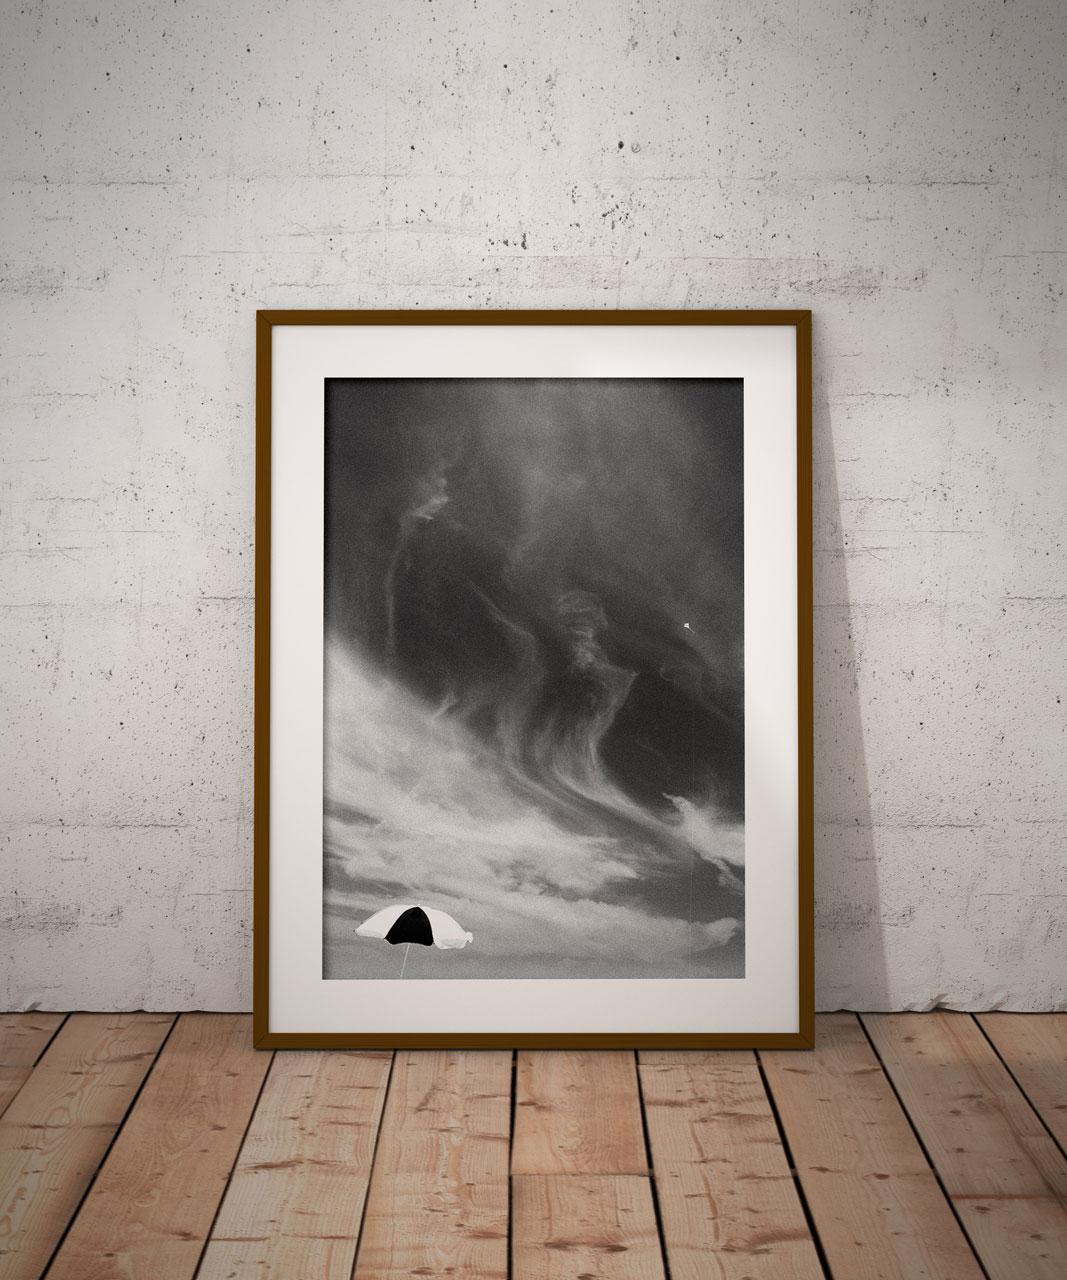 ©Chris Bartlett 'Jones Beach' USA- black and white - parasol against a moody sky. Framed